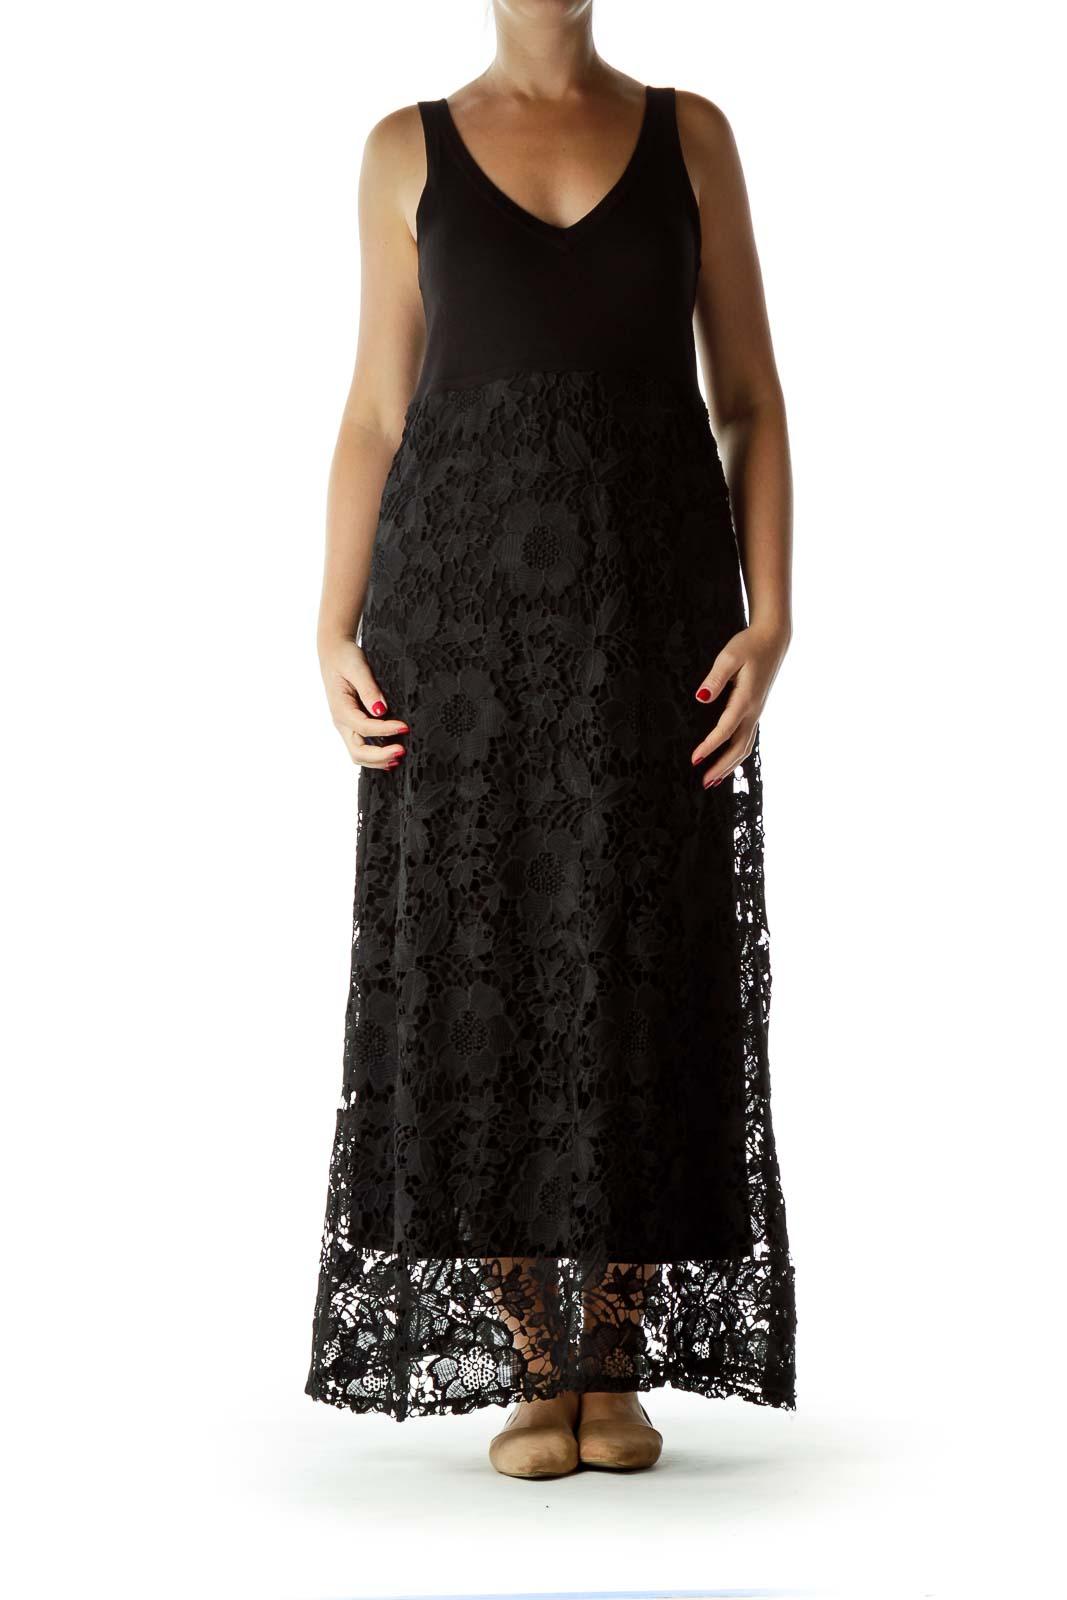 0430ec1f83 Shop Black Lace Maxi Dress clothing and handbags at SilkRoll. Trade with us!